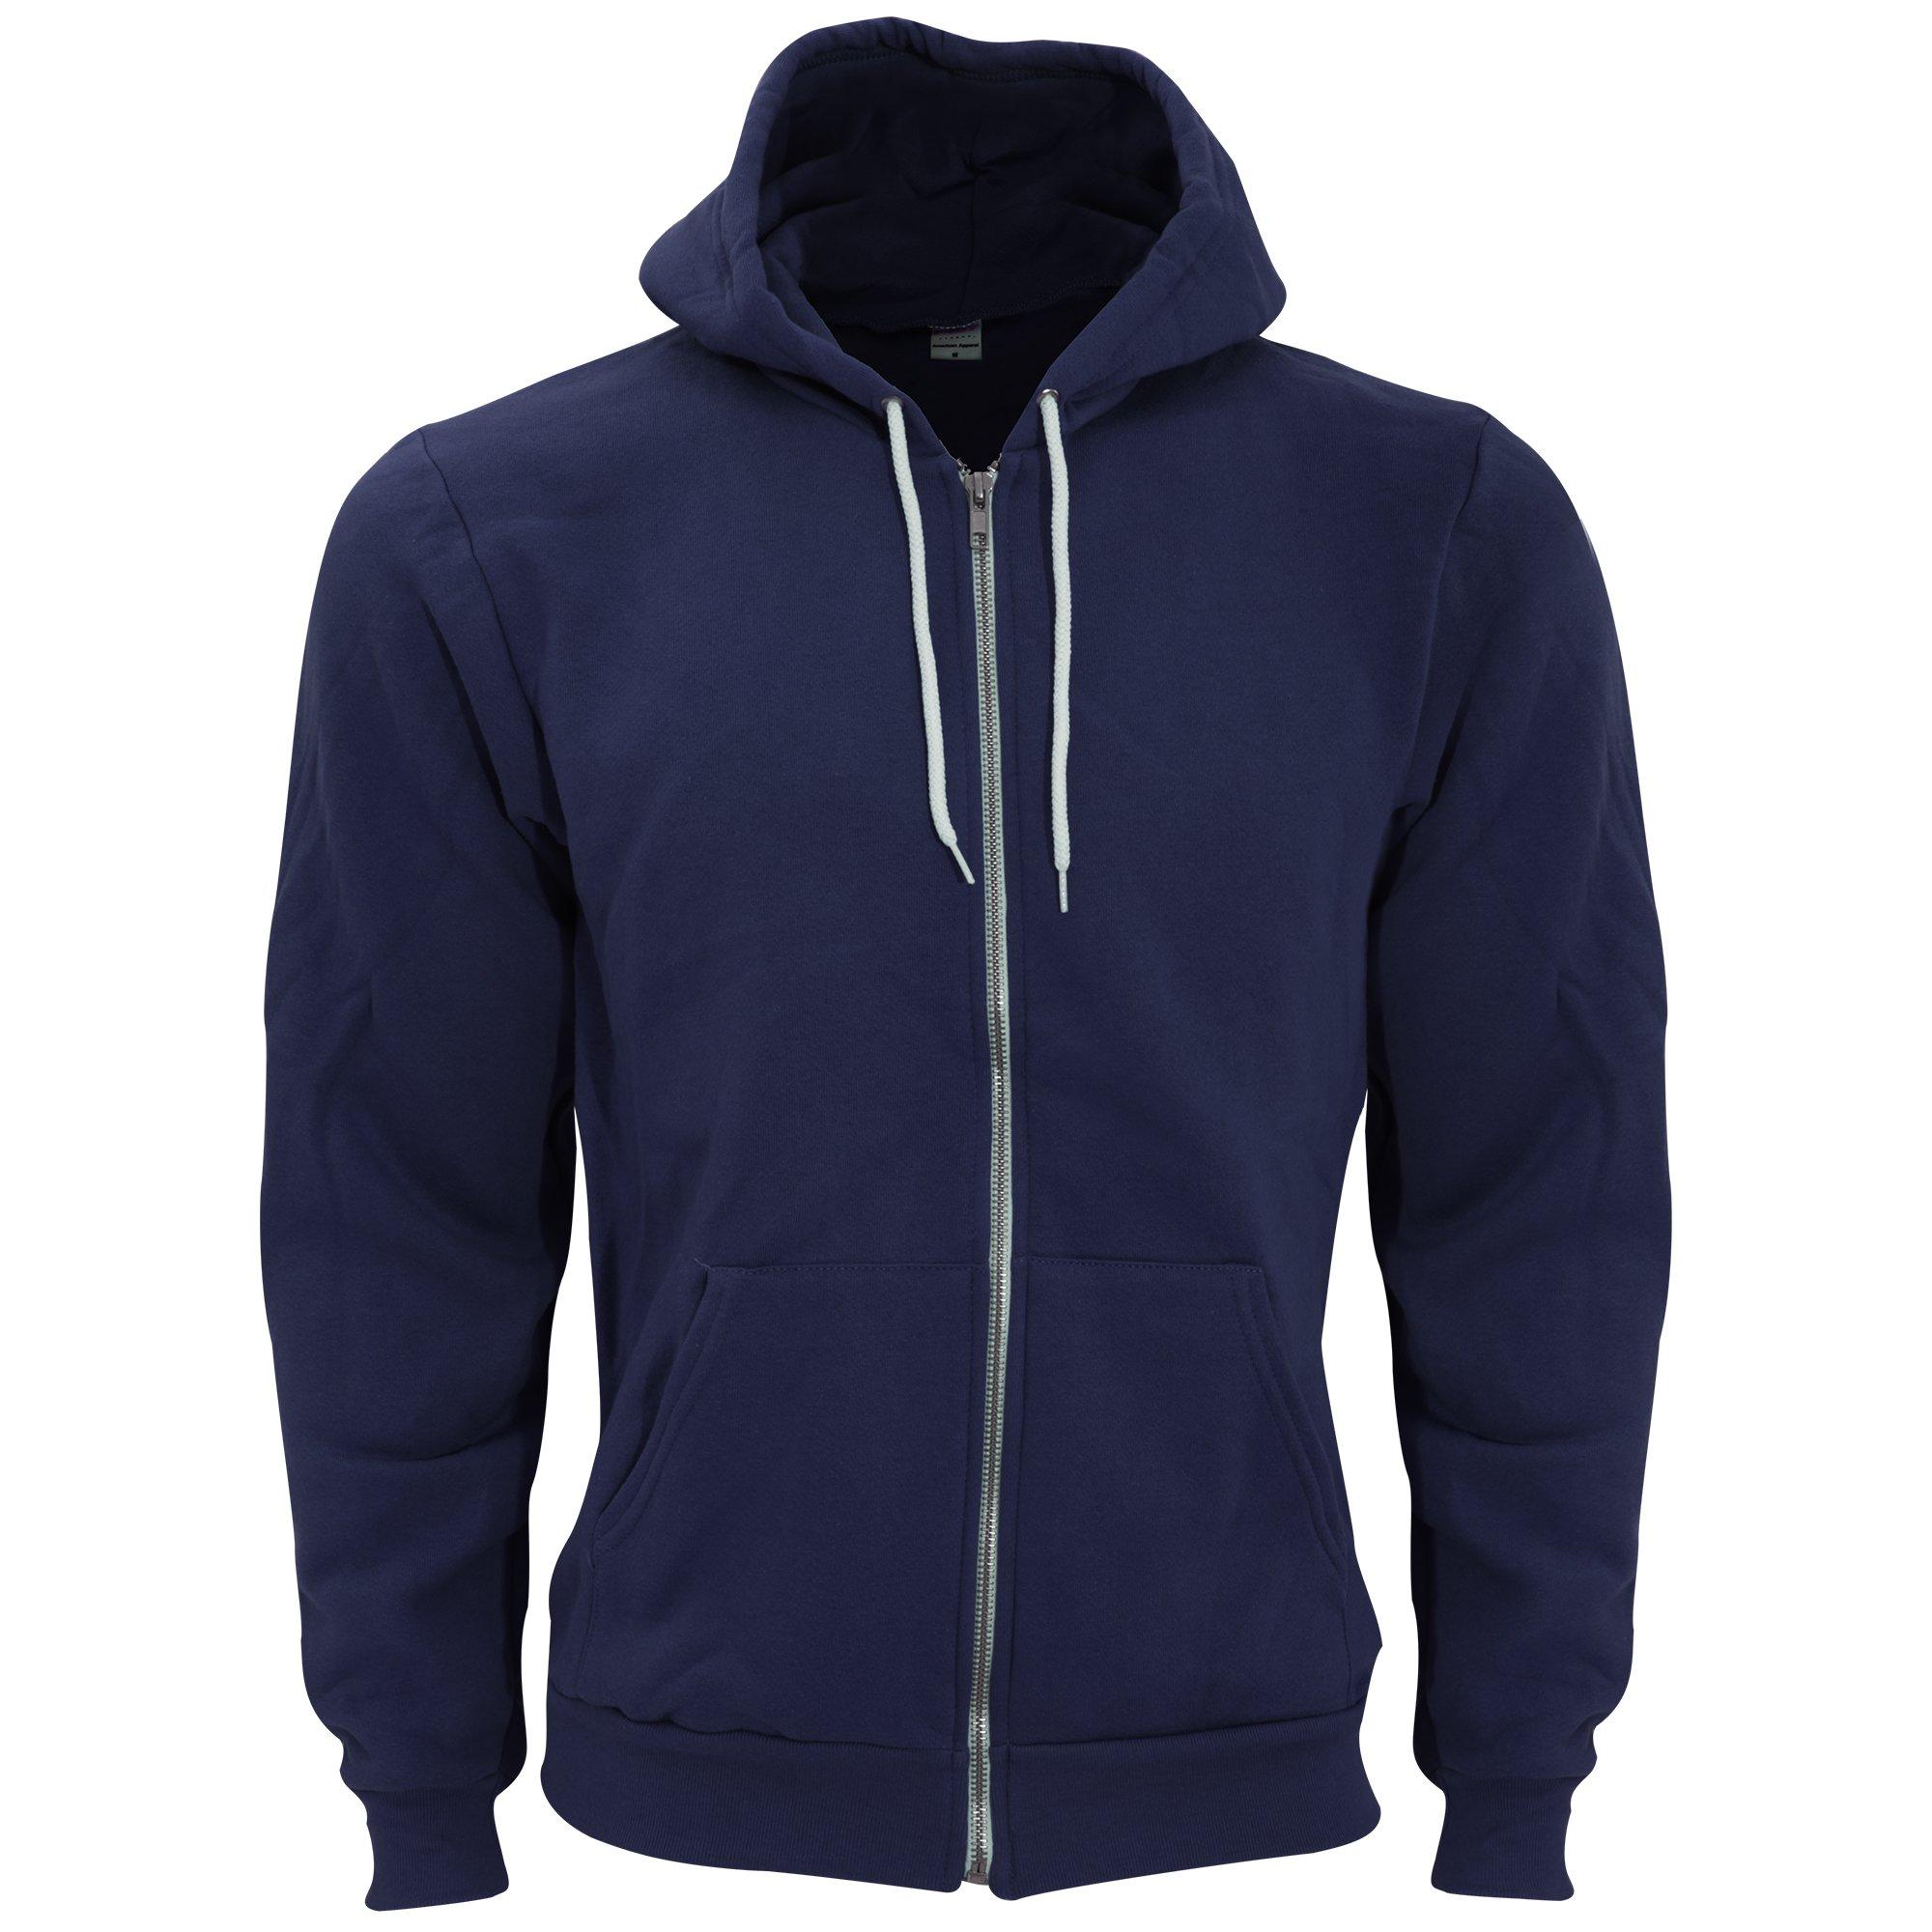 American Apparel Unisex Flex Plain Full Zip Fleece Hoodie (M) (Navy)